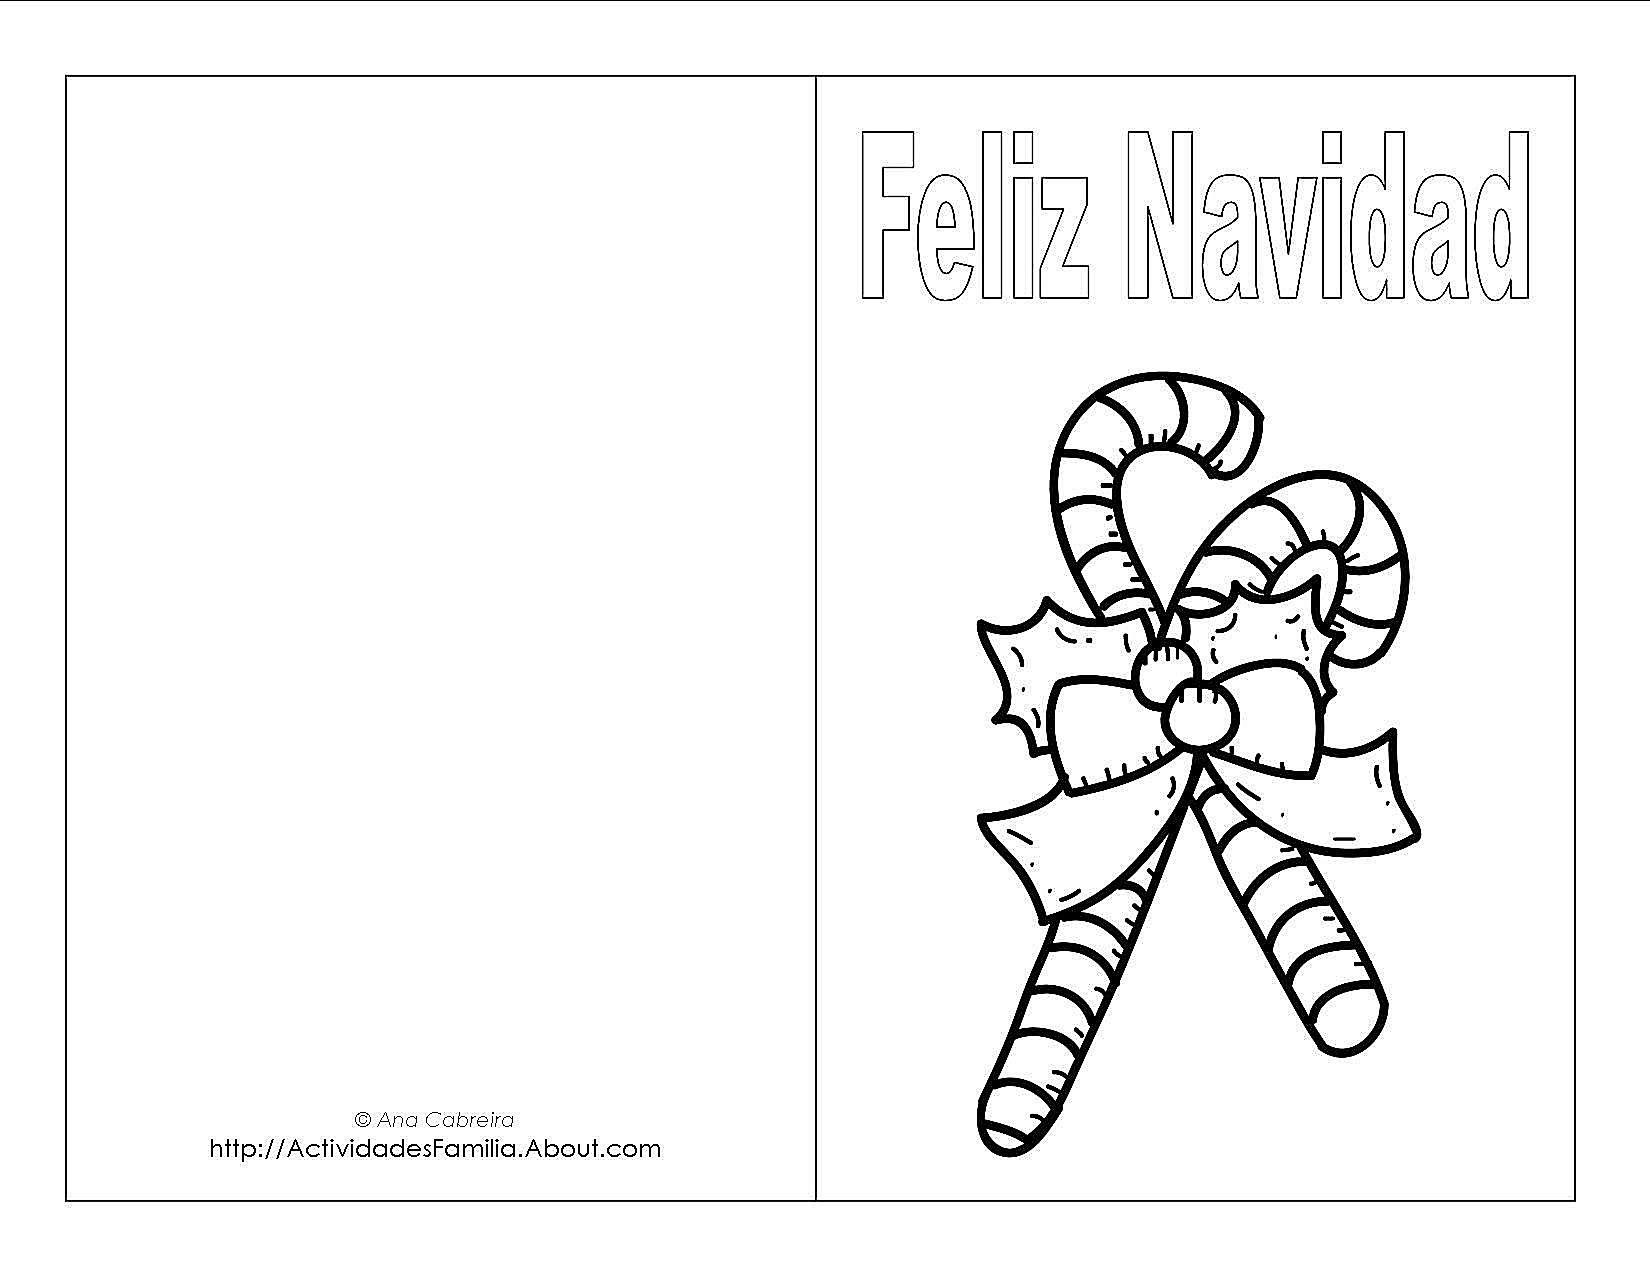 Dibujos Para Tarjetas De Navidad Para Ninos.Tarjetas De Navidad Para Imprimir Y Colorear